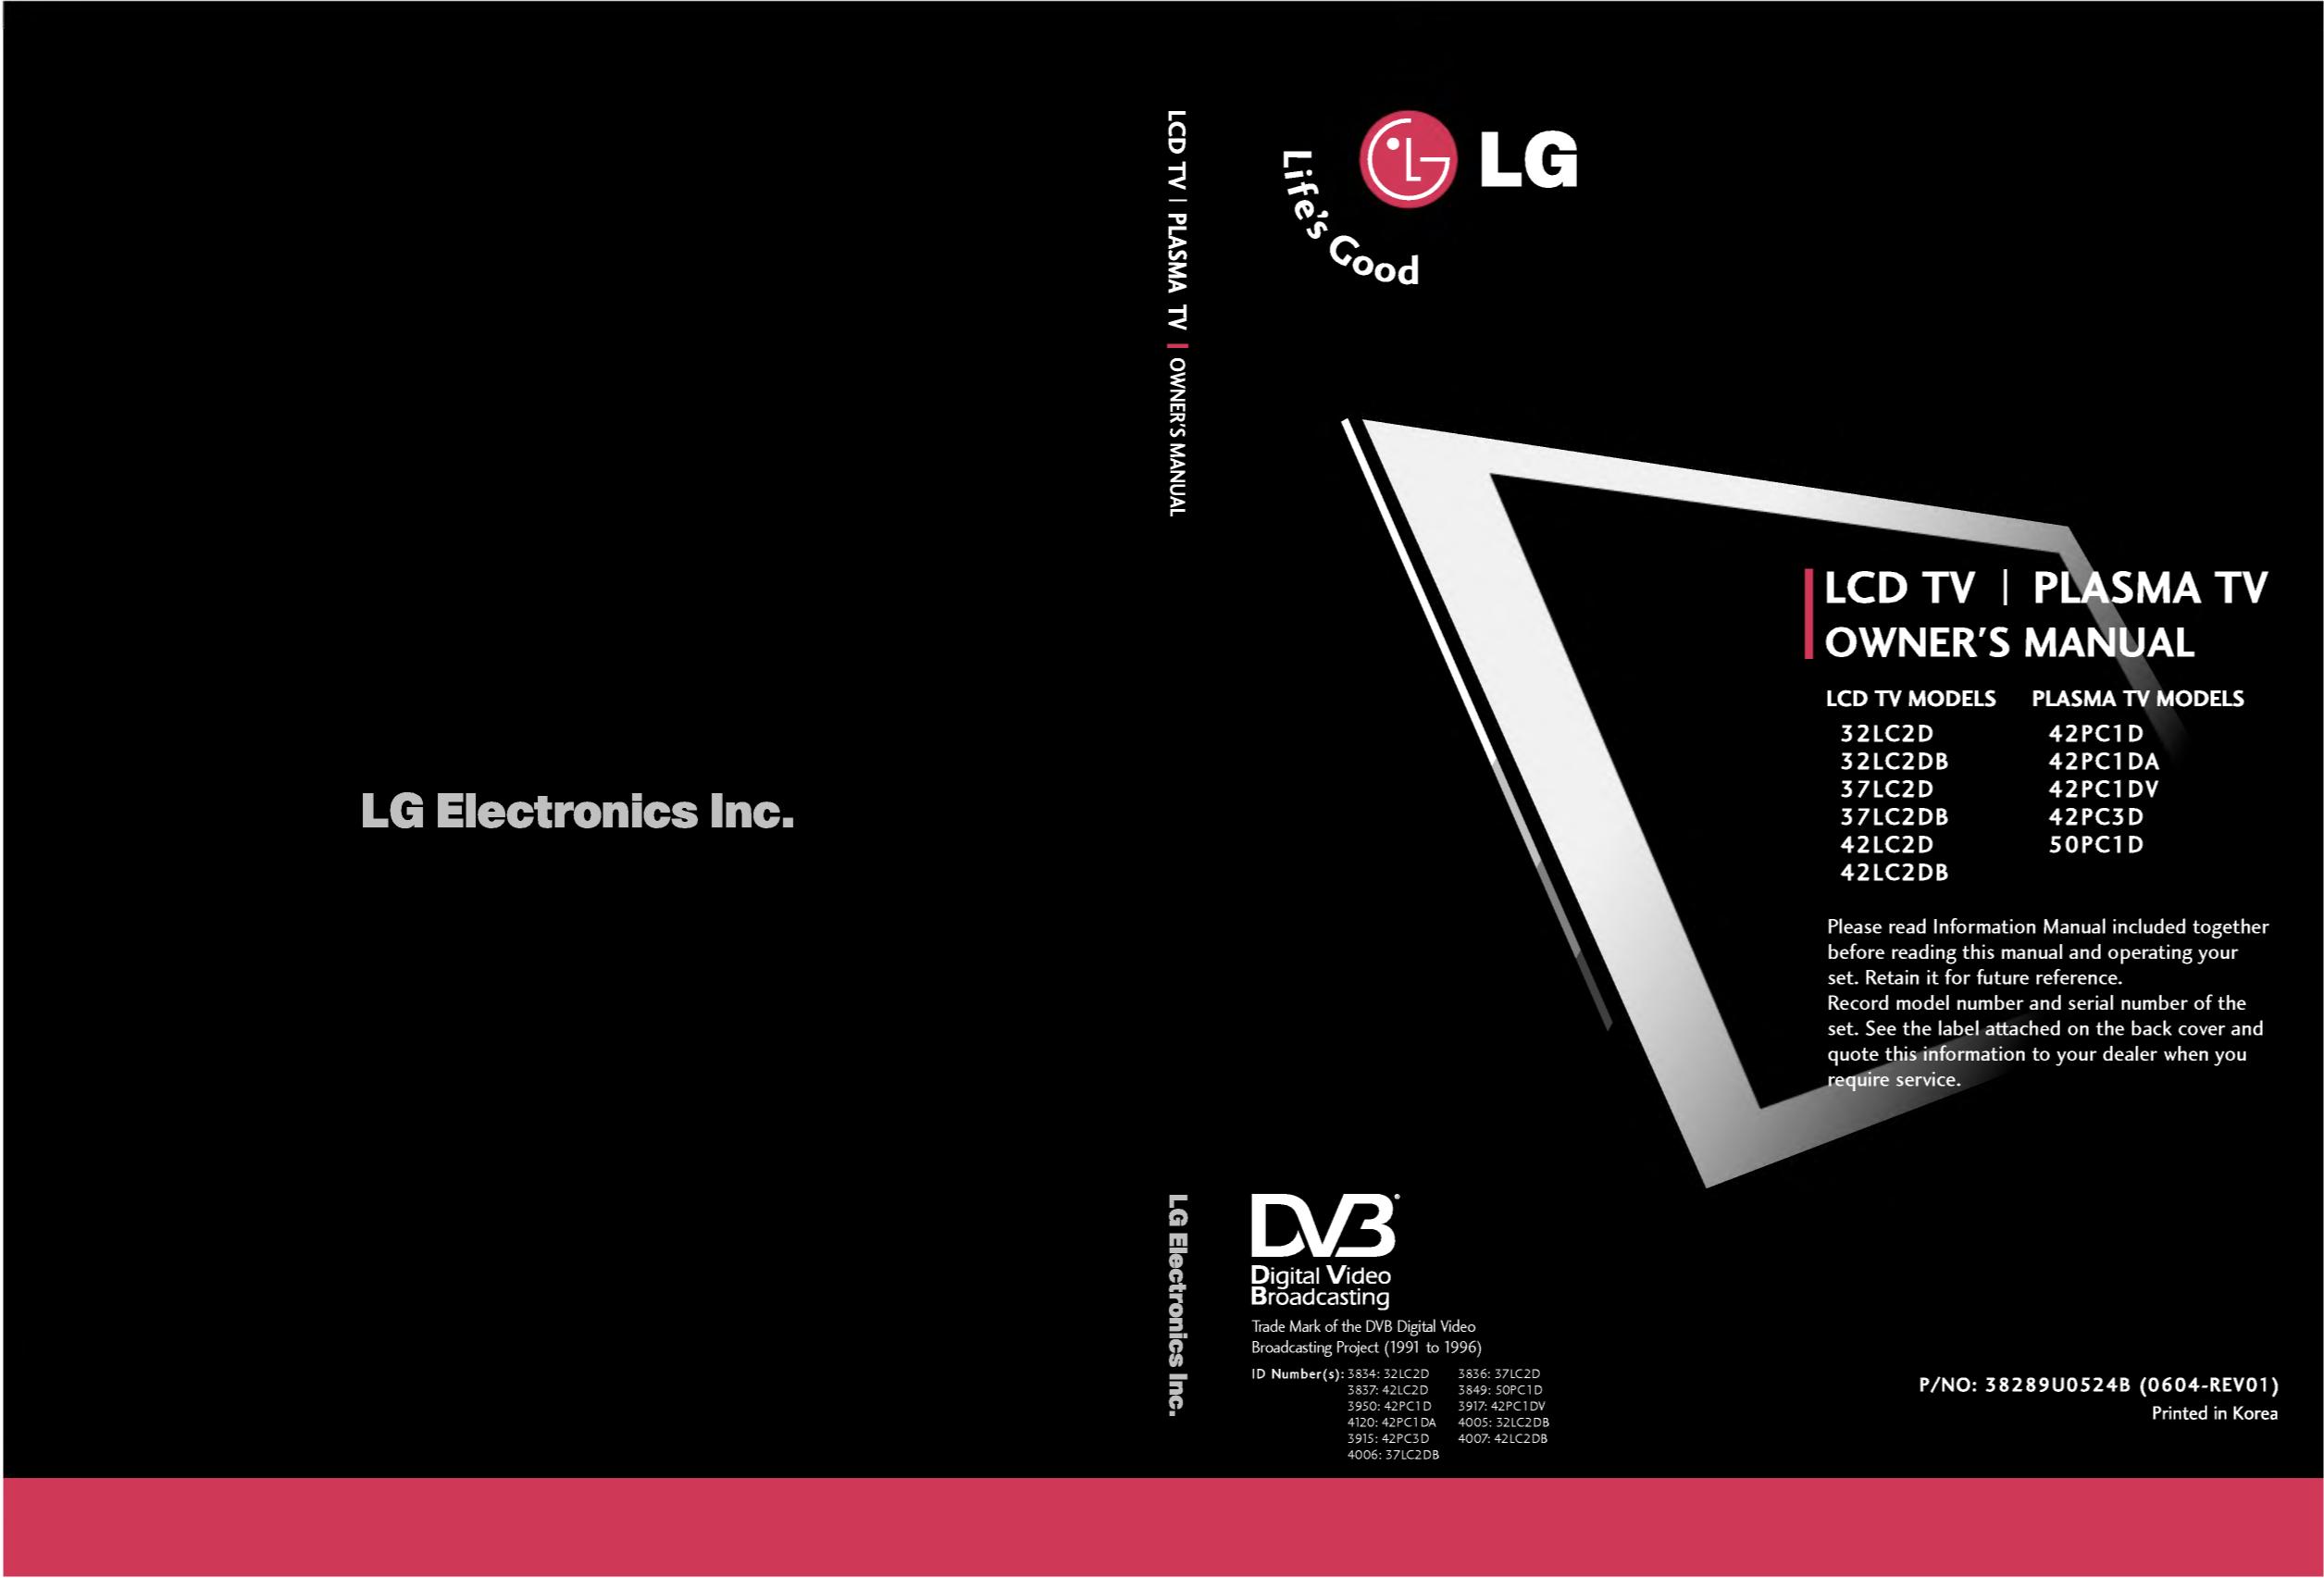 pdf for LG TV 42LC2D manual